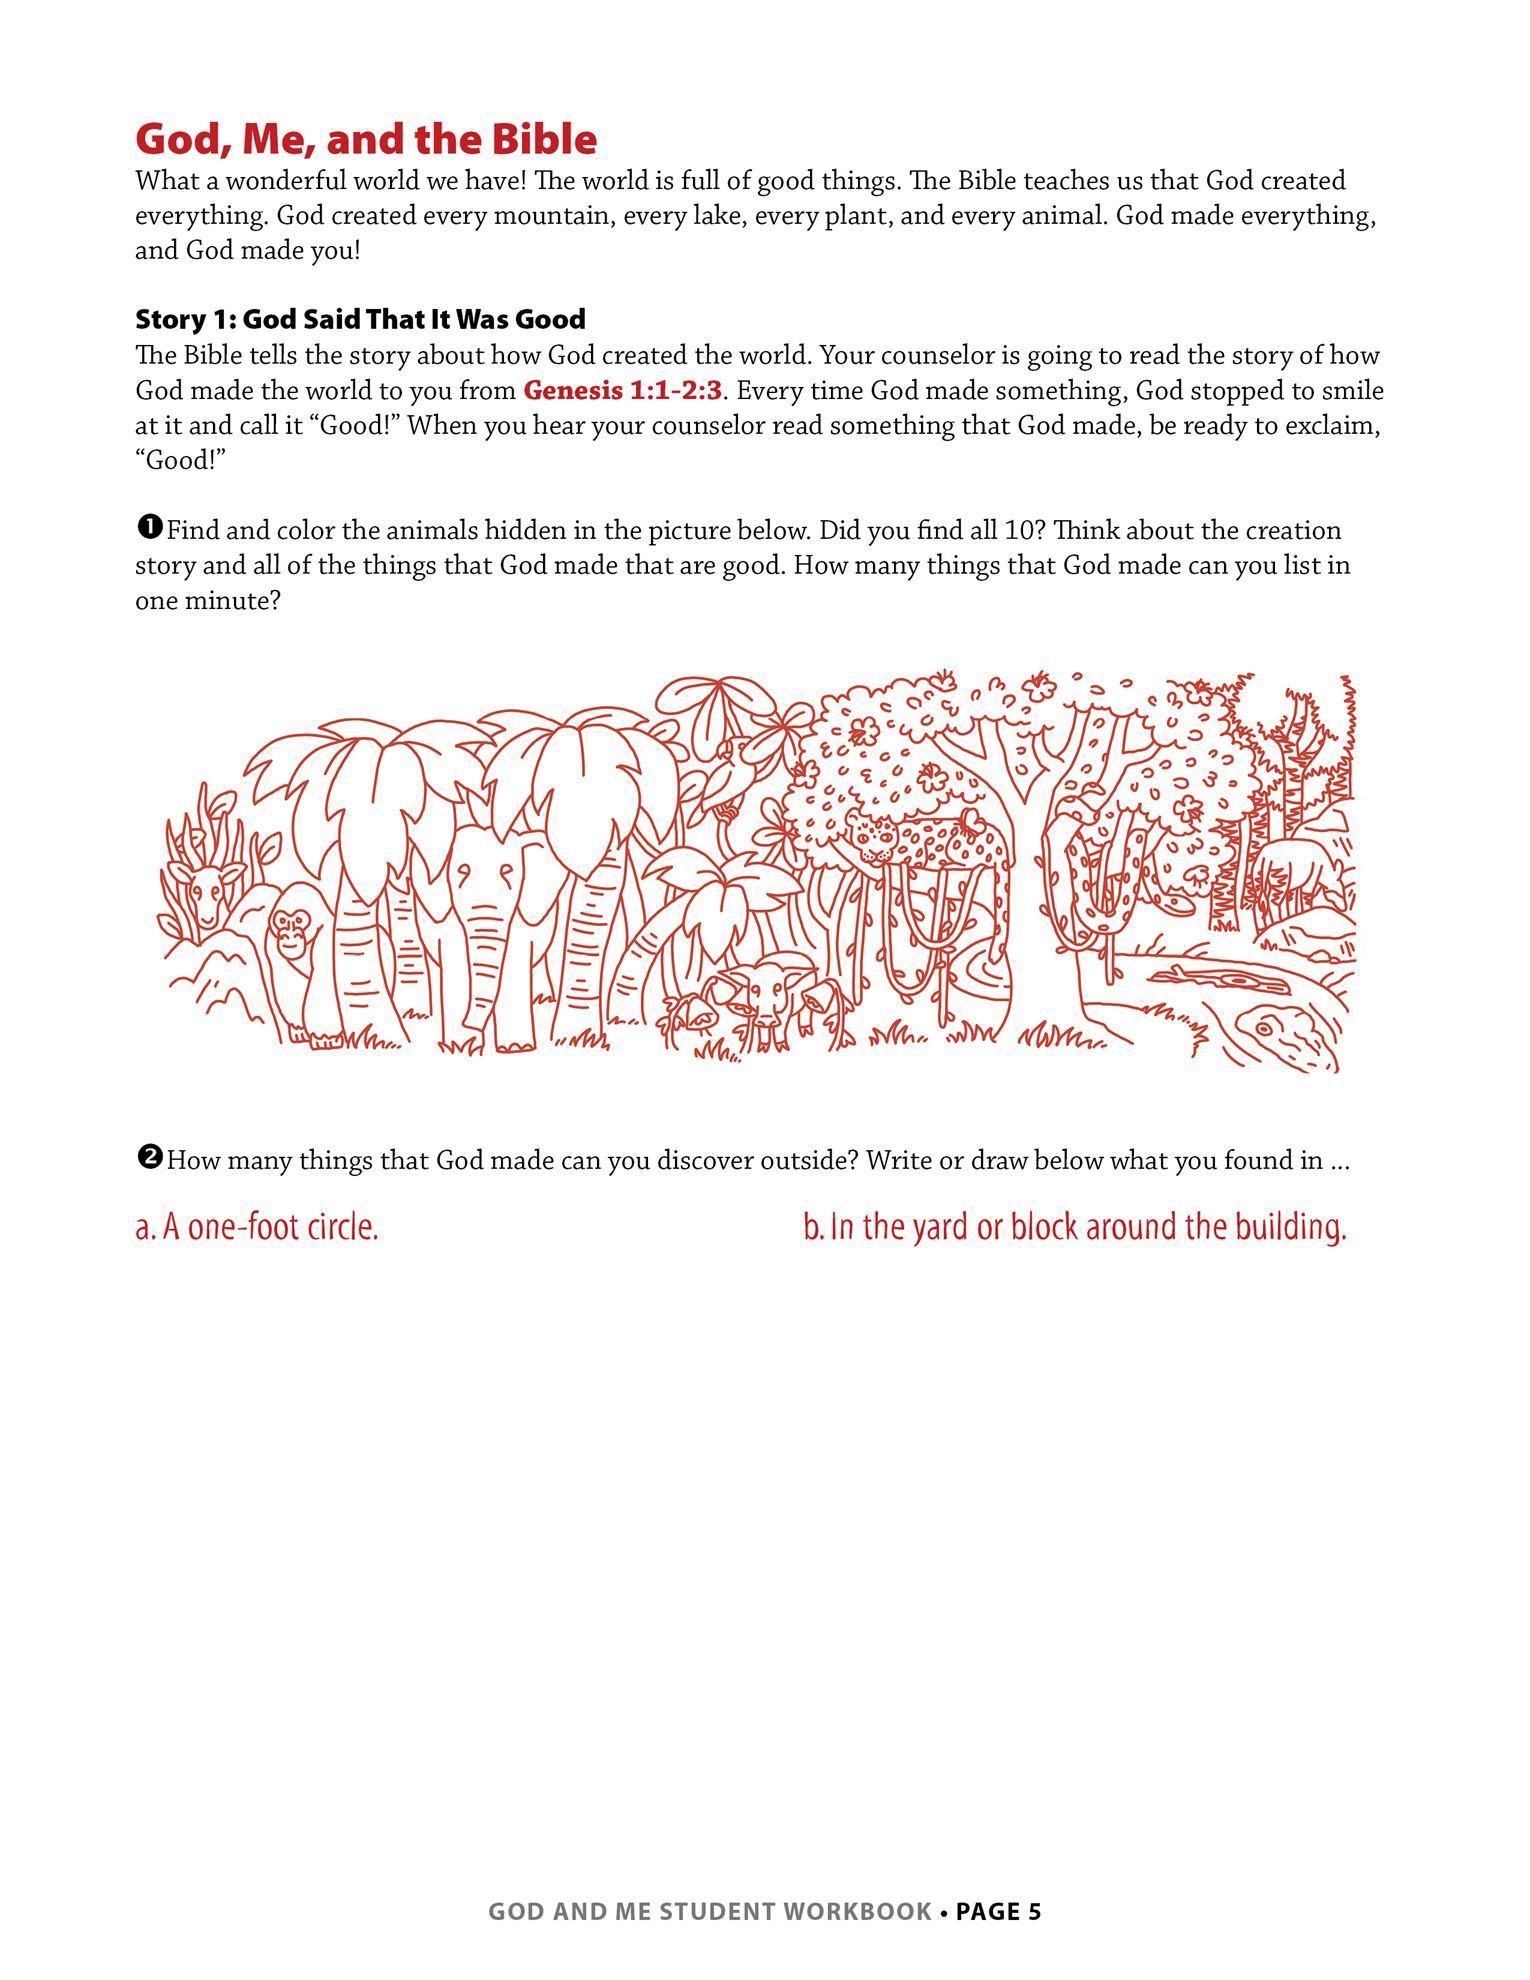 Lesson 1, page 5